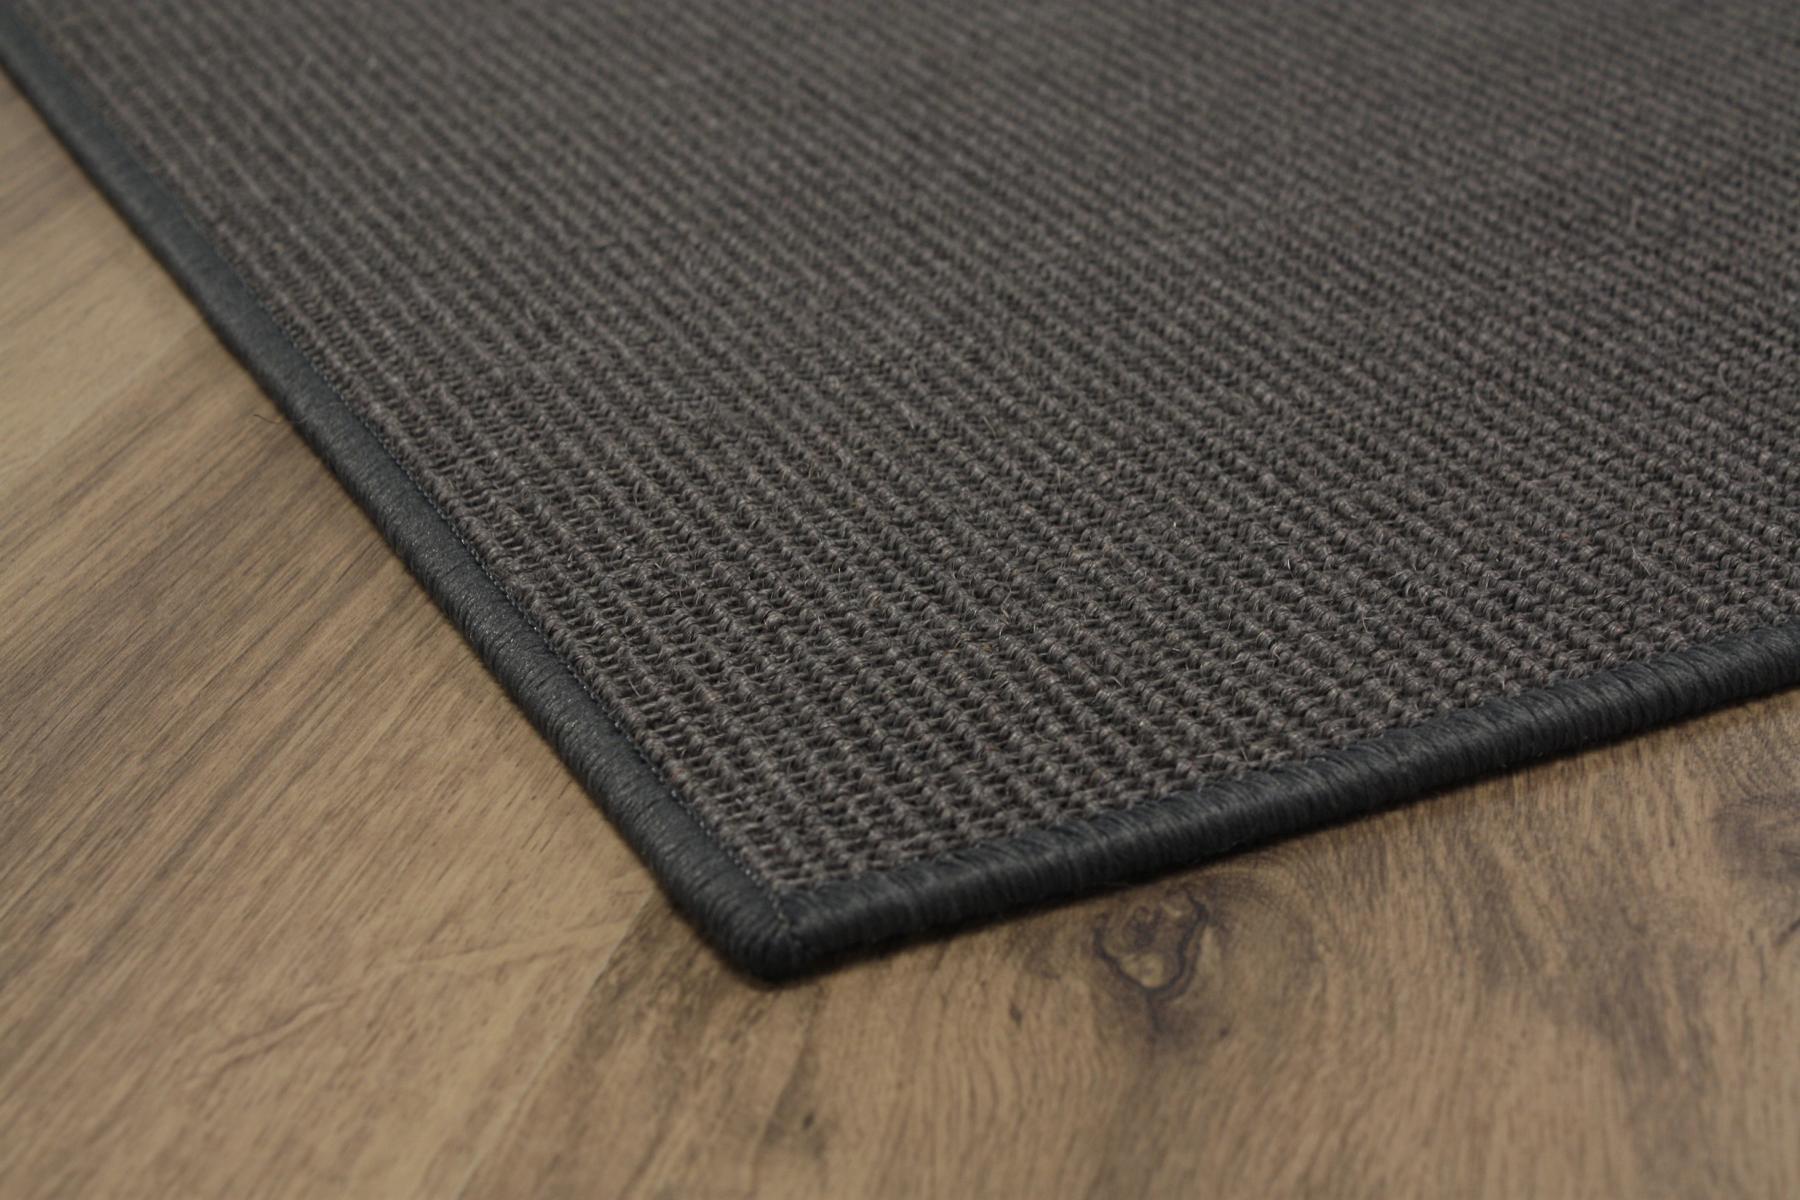 sisal teppich umkettelt anthrazit 200x300cm 100 sisal gekettelt ebay. Black Bedroom Furniture Sets. Home Design Ideas